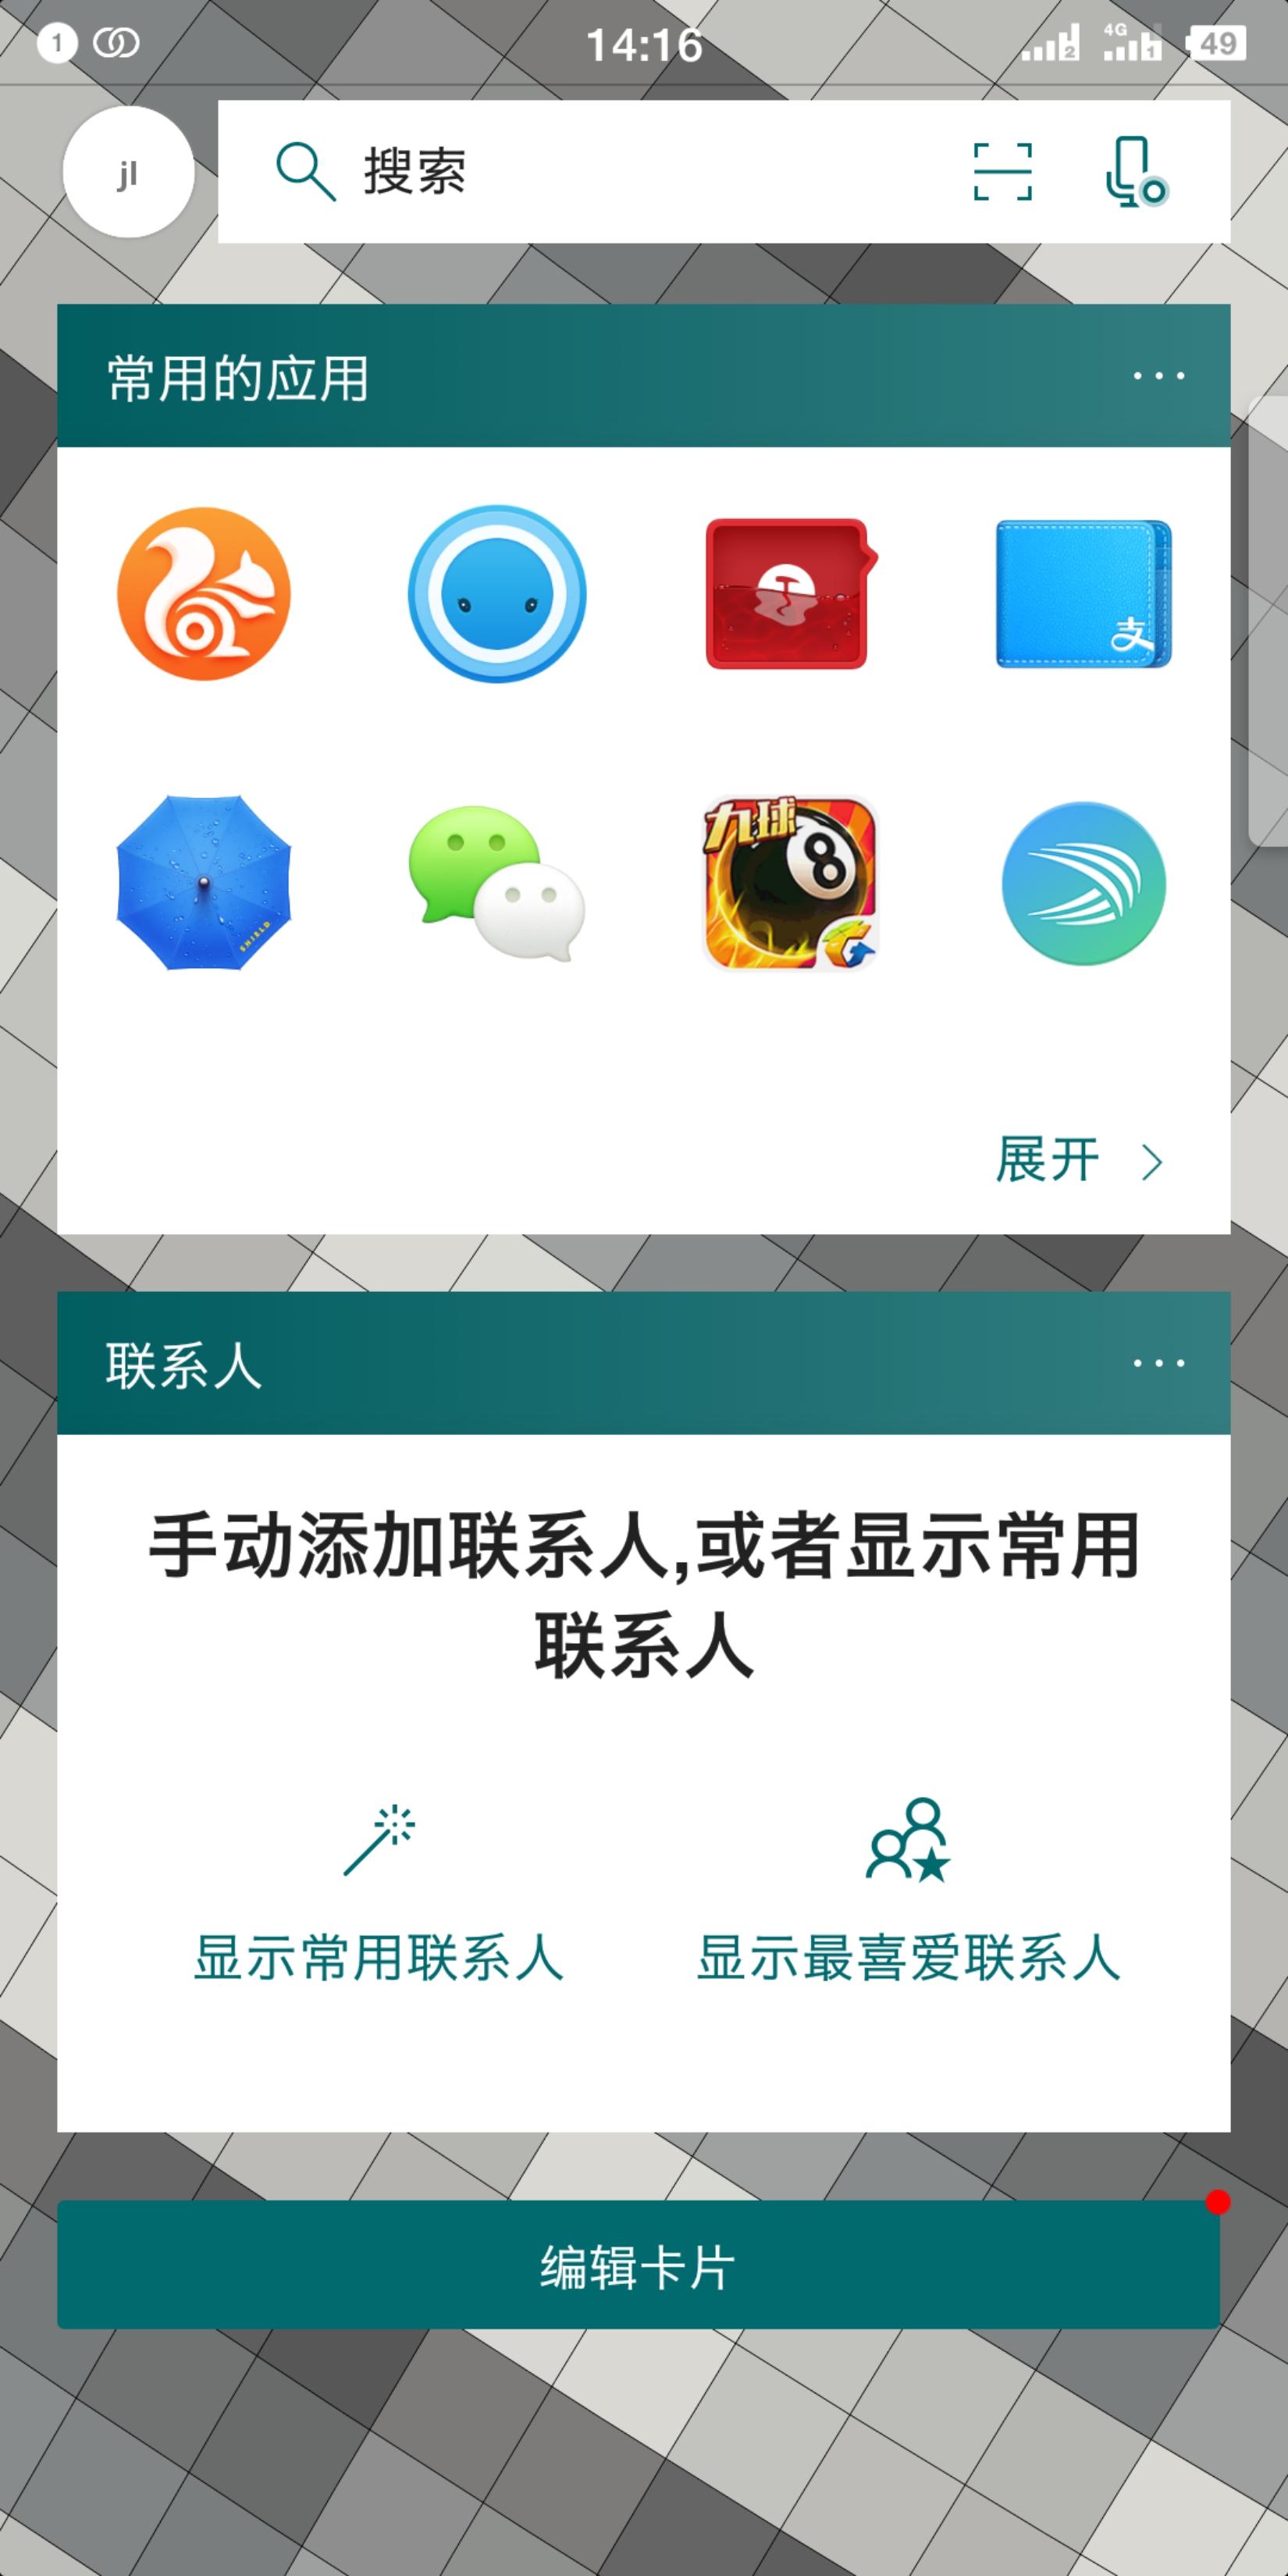 Screenshot_2018-06-12-14-16-25-328_Microsoft Launcher.png